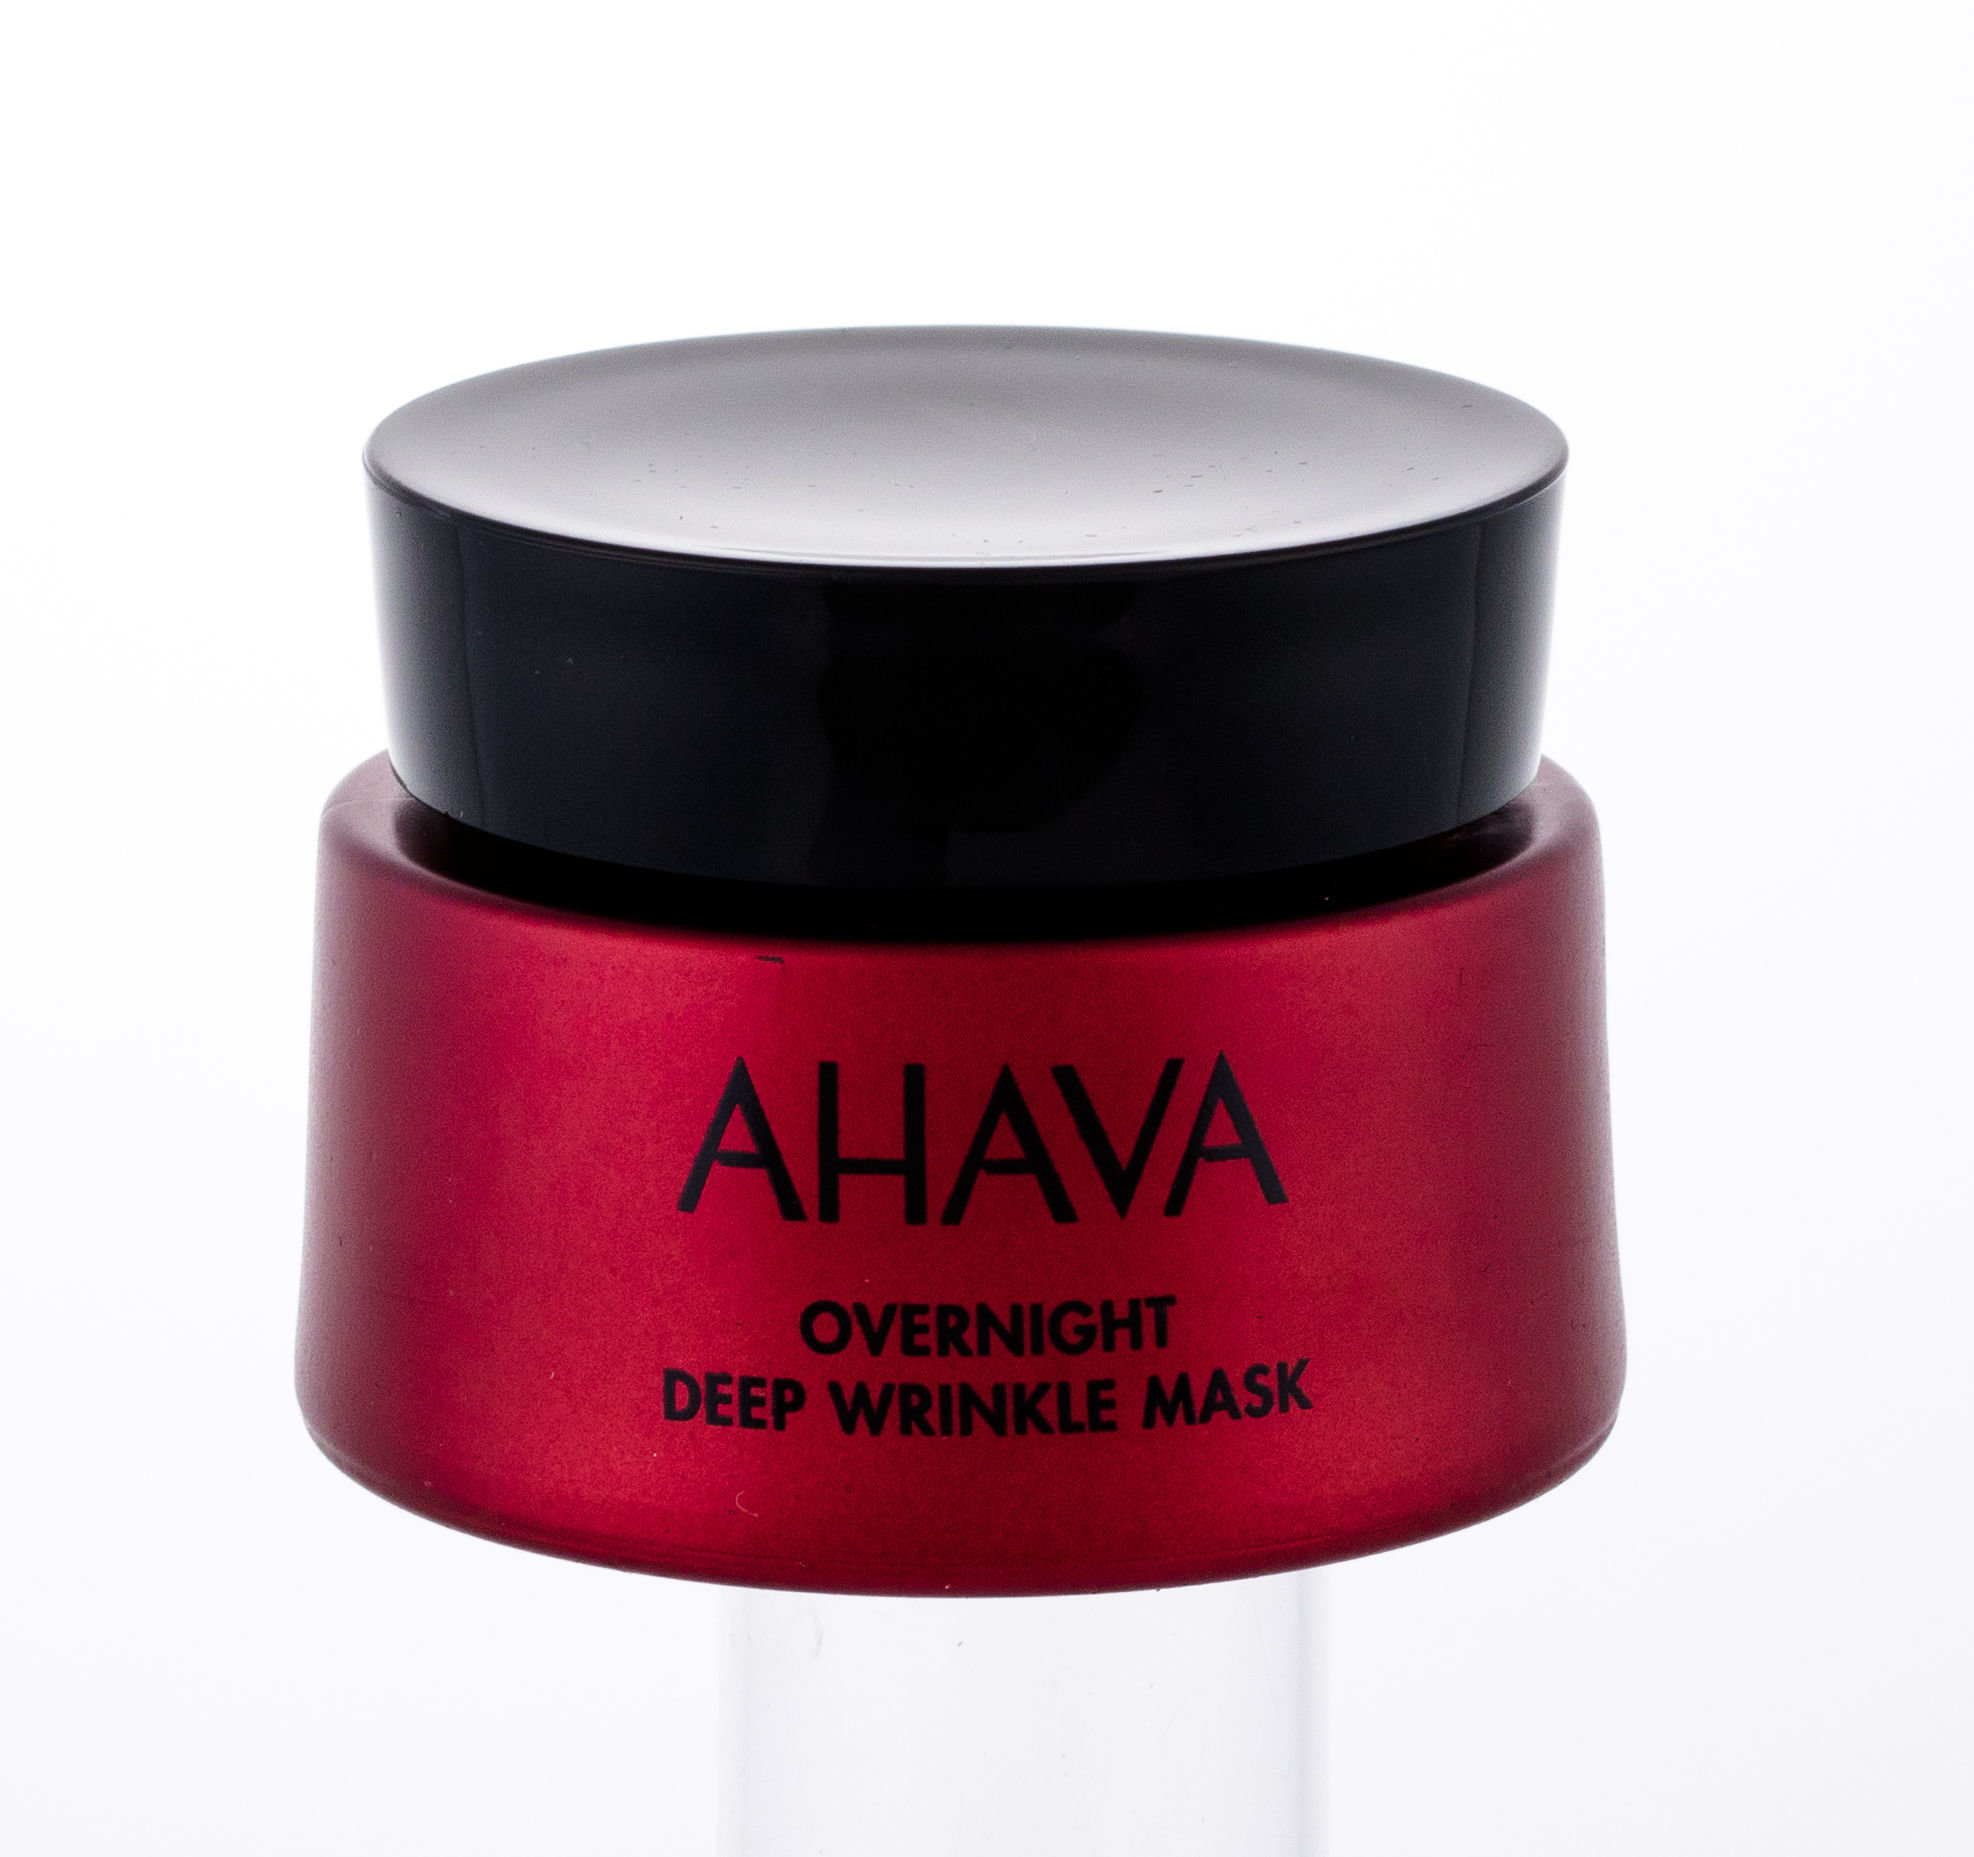 AHAVA Apple Of Sodom Face Mask 50ml  Overnight Deep Wrinkle Mask